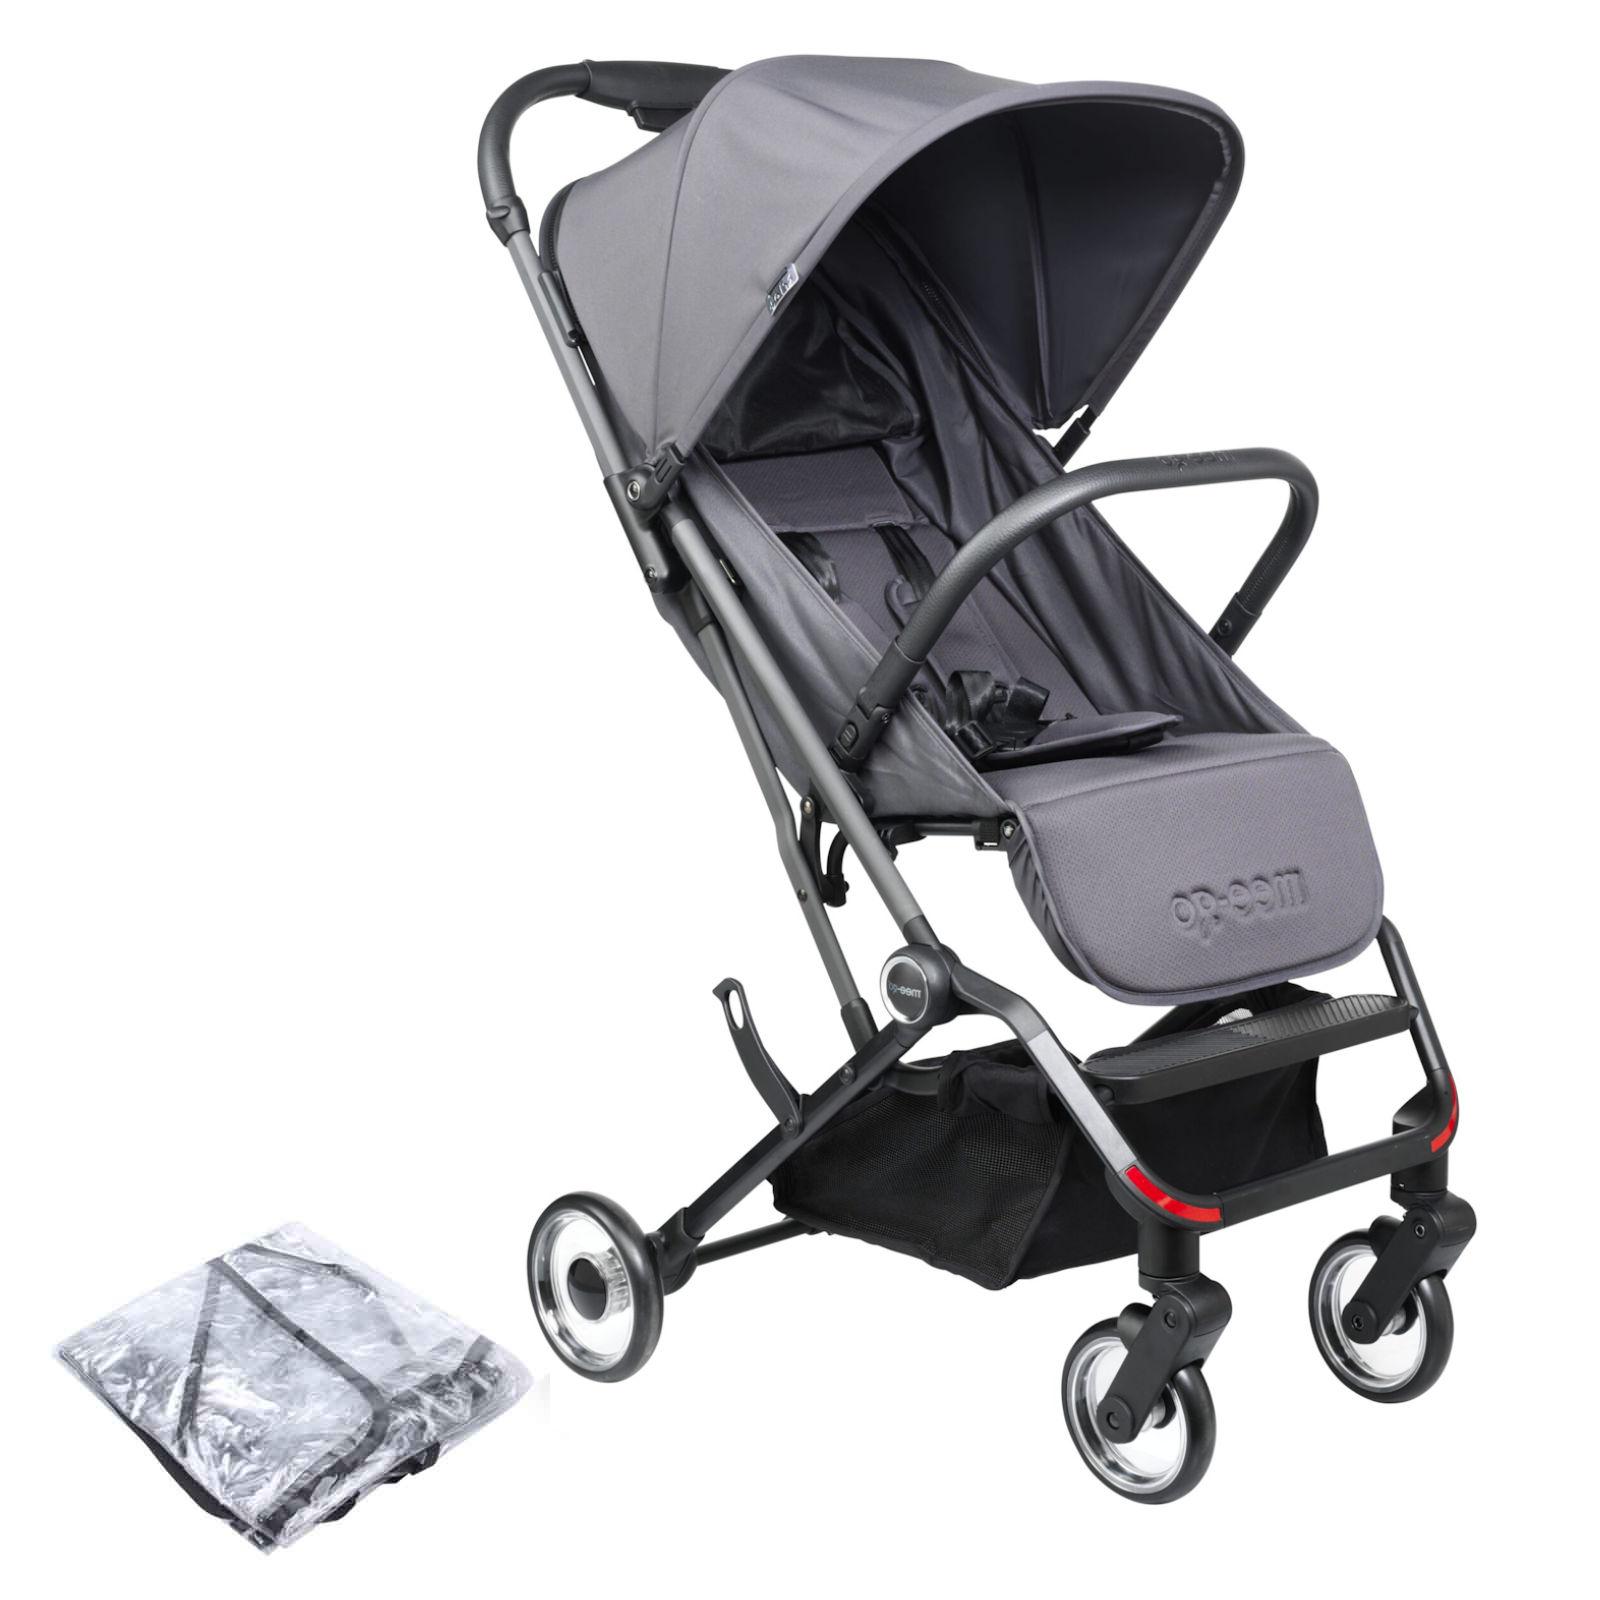 Mee-Go Trio Plus Pushchair Stroller - Slate Grey